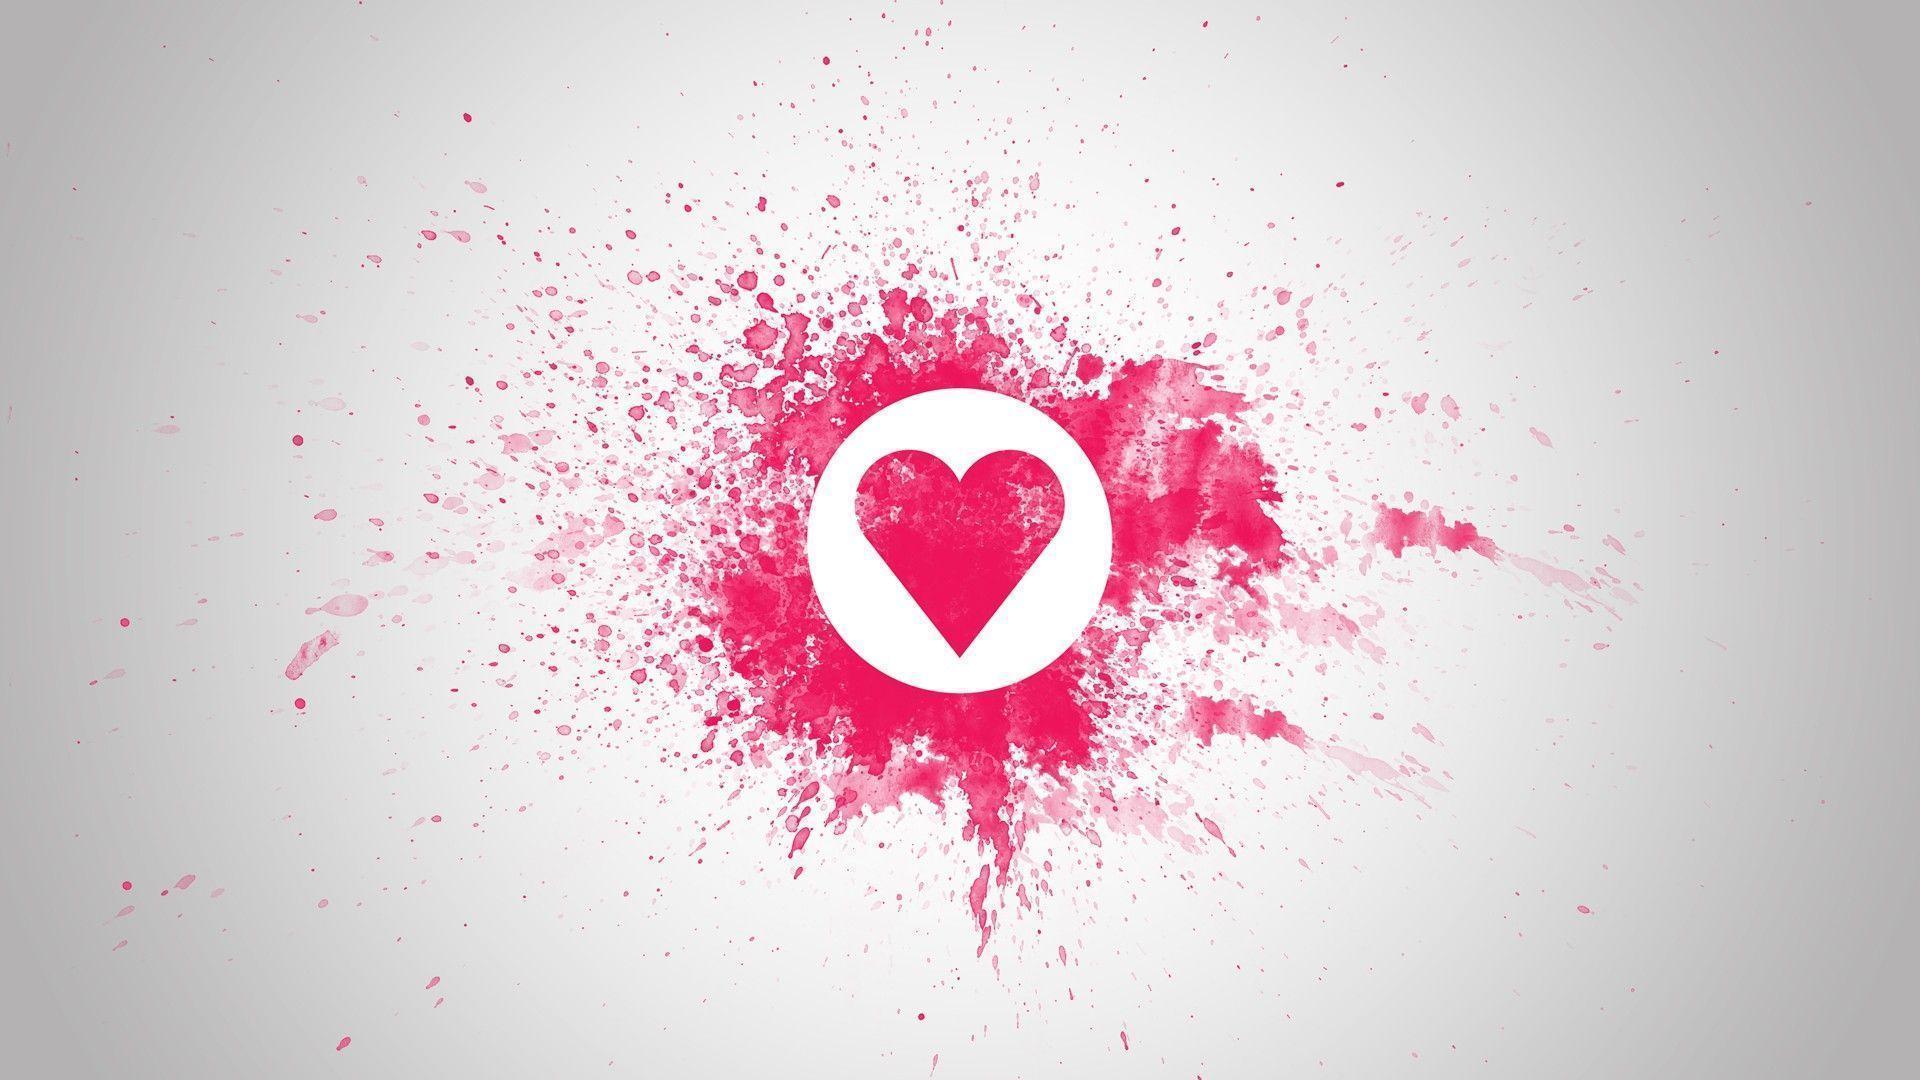 Cool heart backgrounds wallpaper cave - Heart to heart wallpaper ...